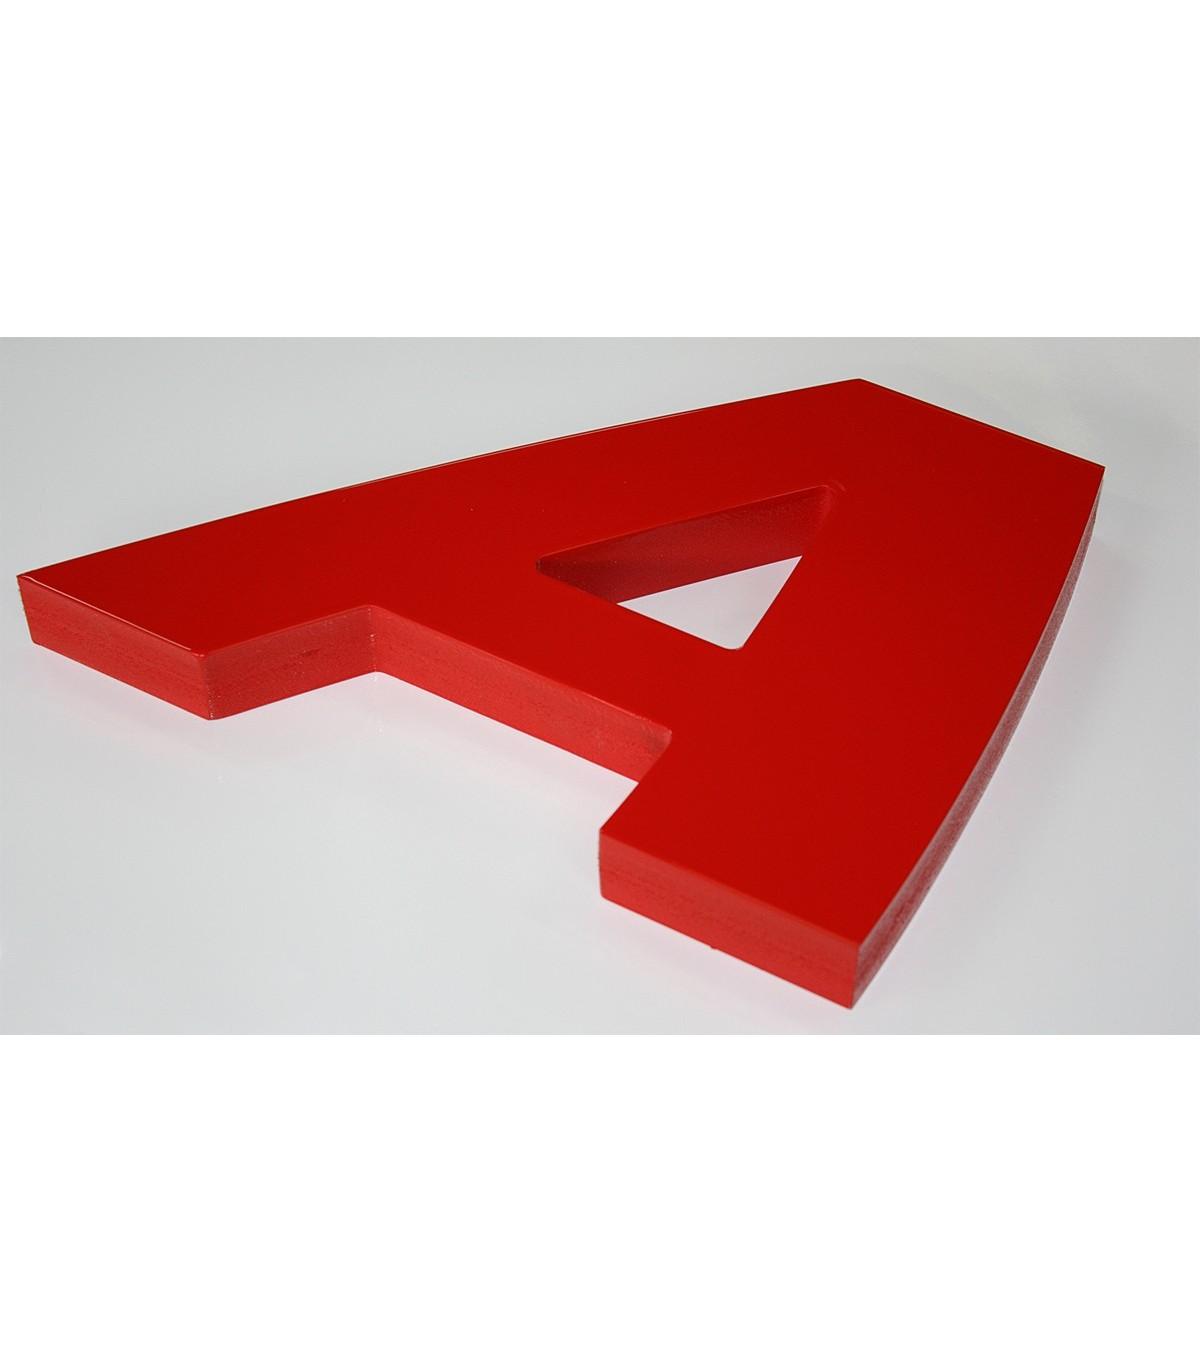 Lettre en plexiglas